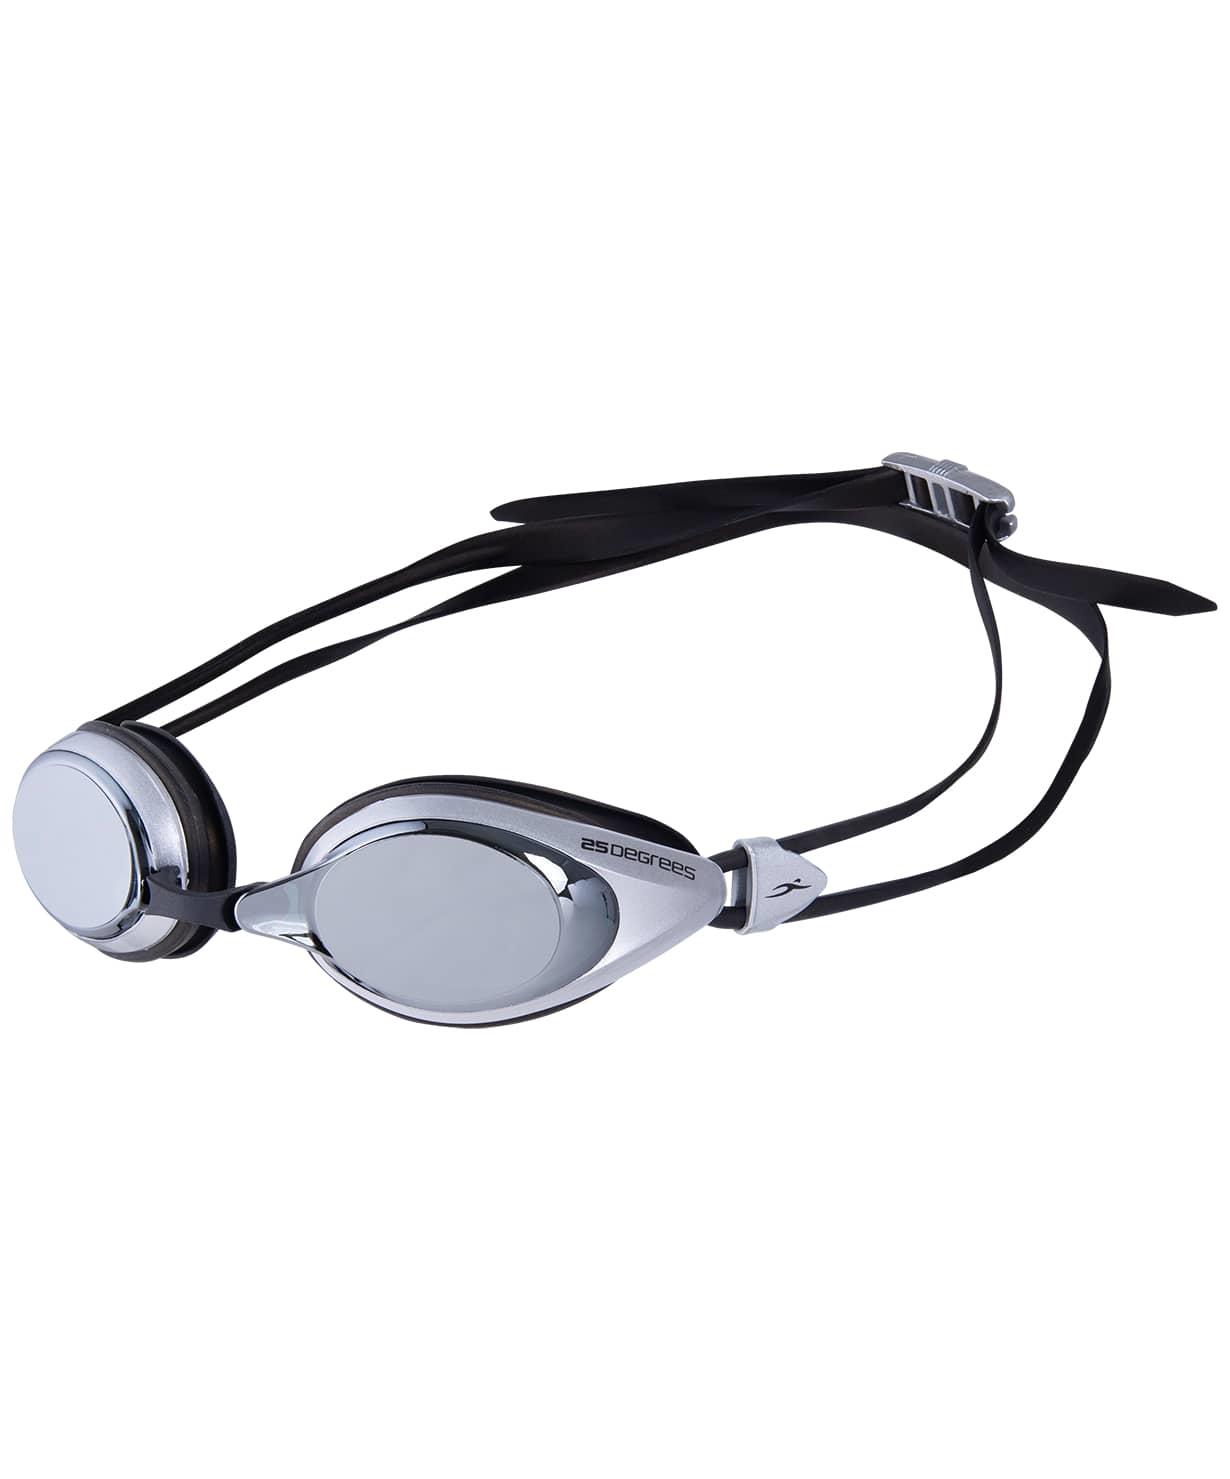 Очки для плавания Pulso Mirrored White/Black